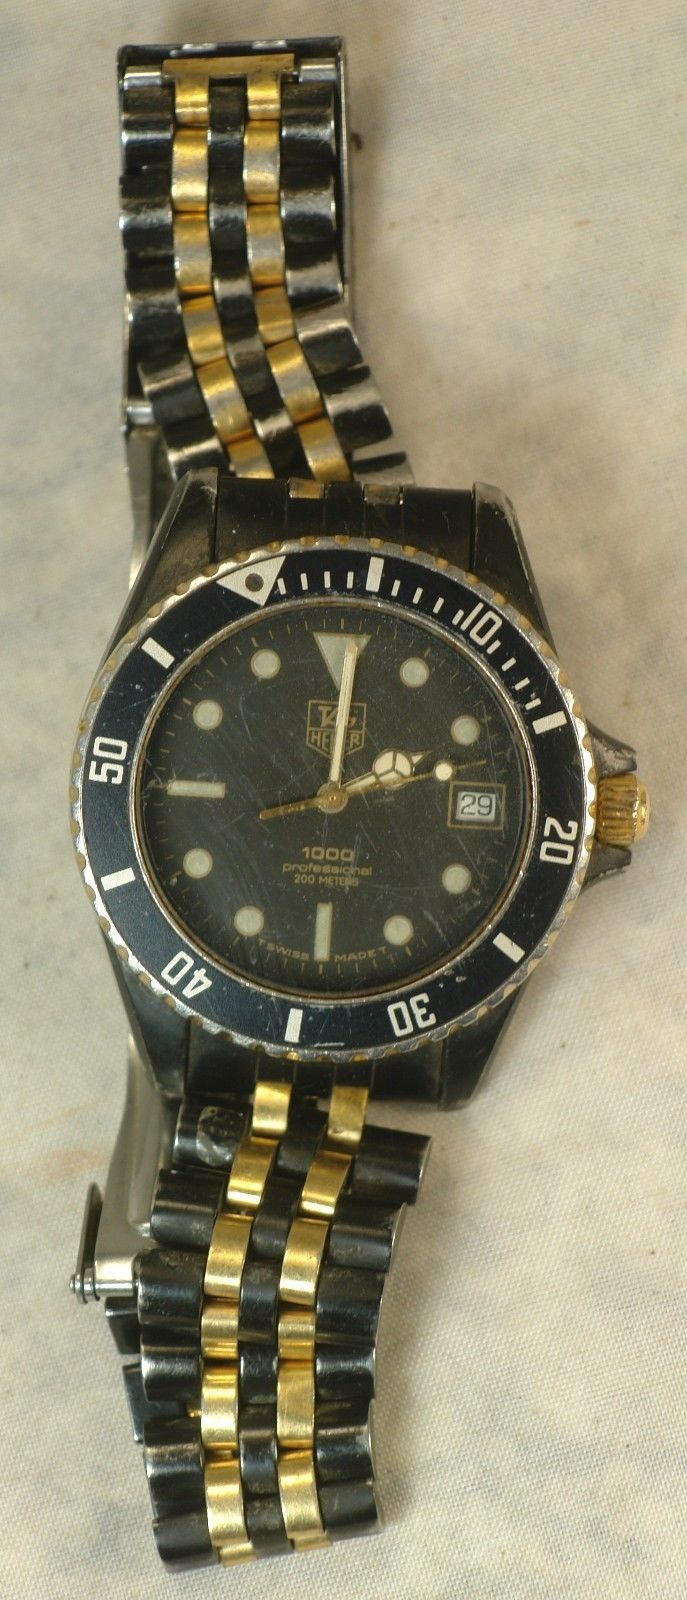 Vintage Mens Tag Heuer 1000 Professional 200M # 980.029N New Battery 7 Jewel